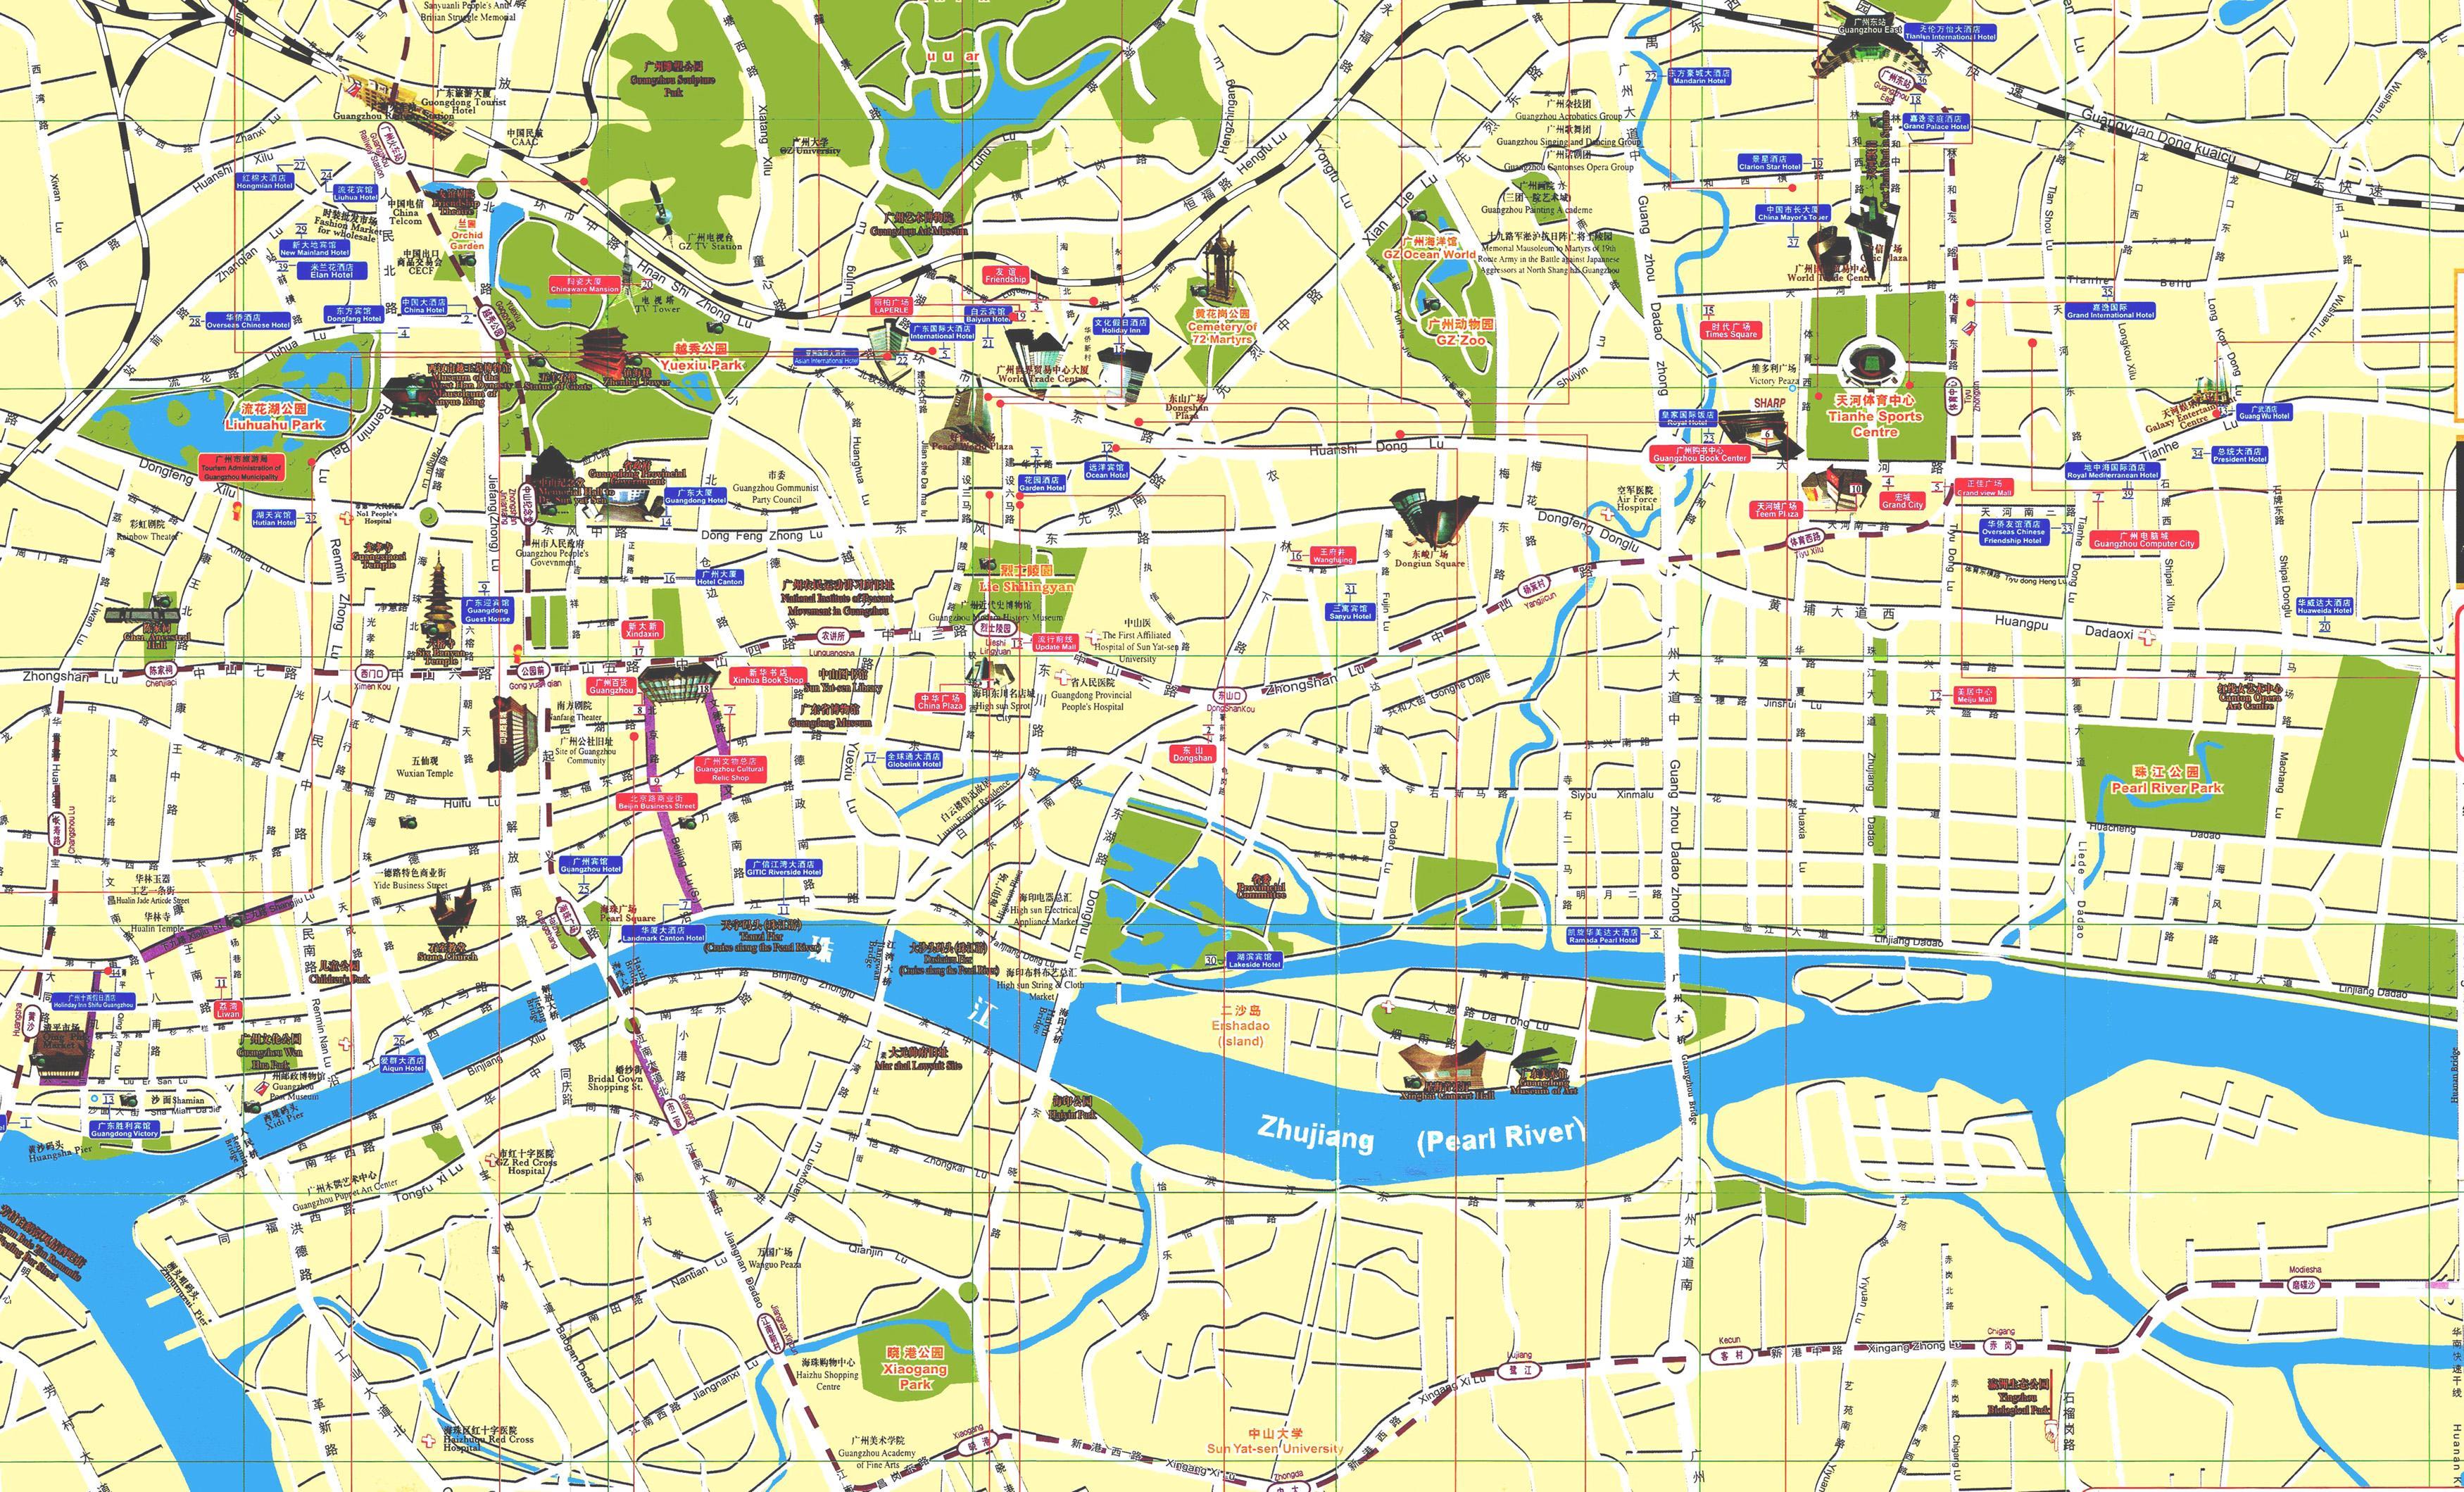 china travel guide book pdf